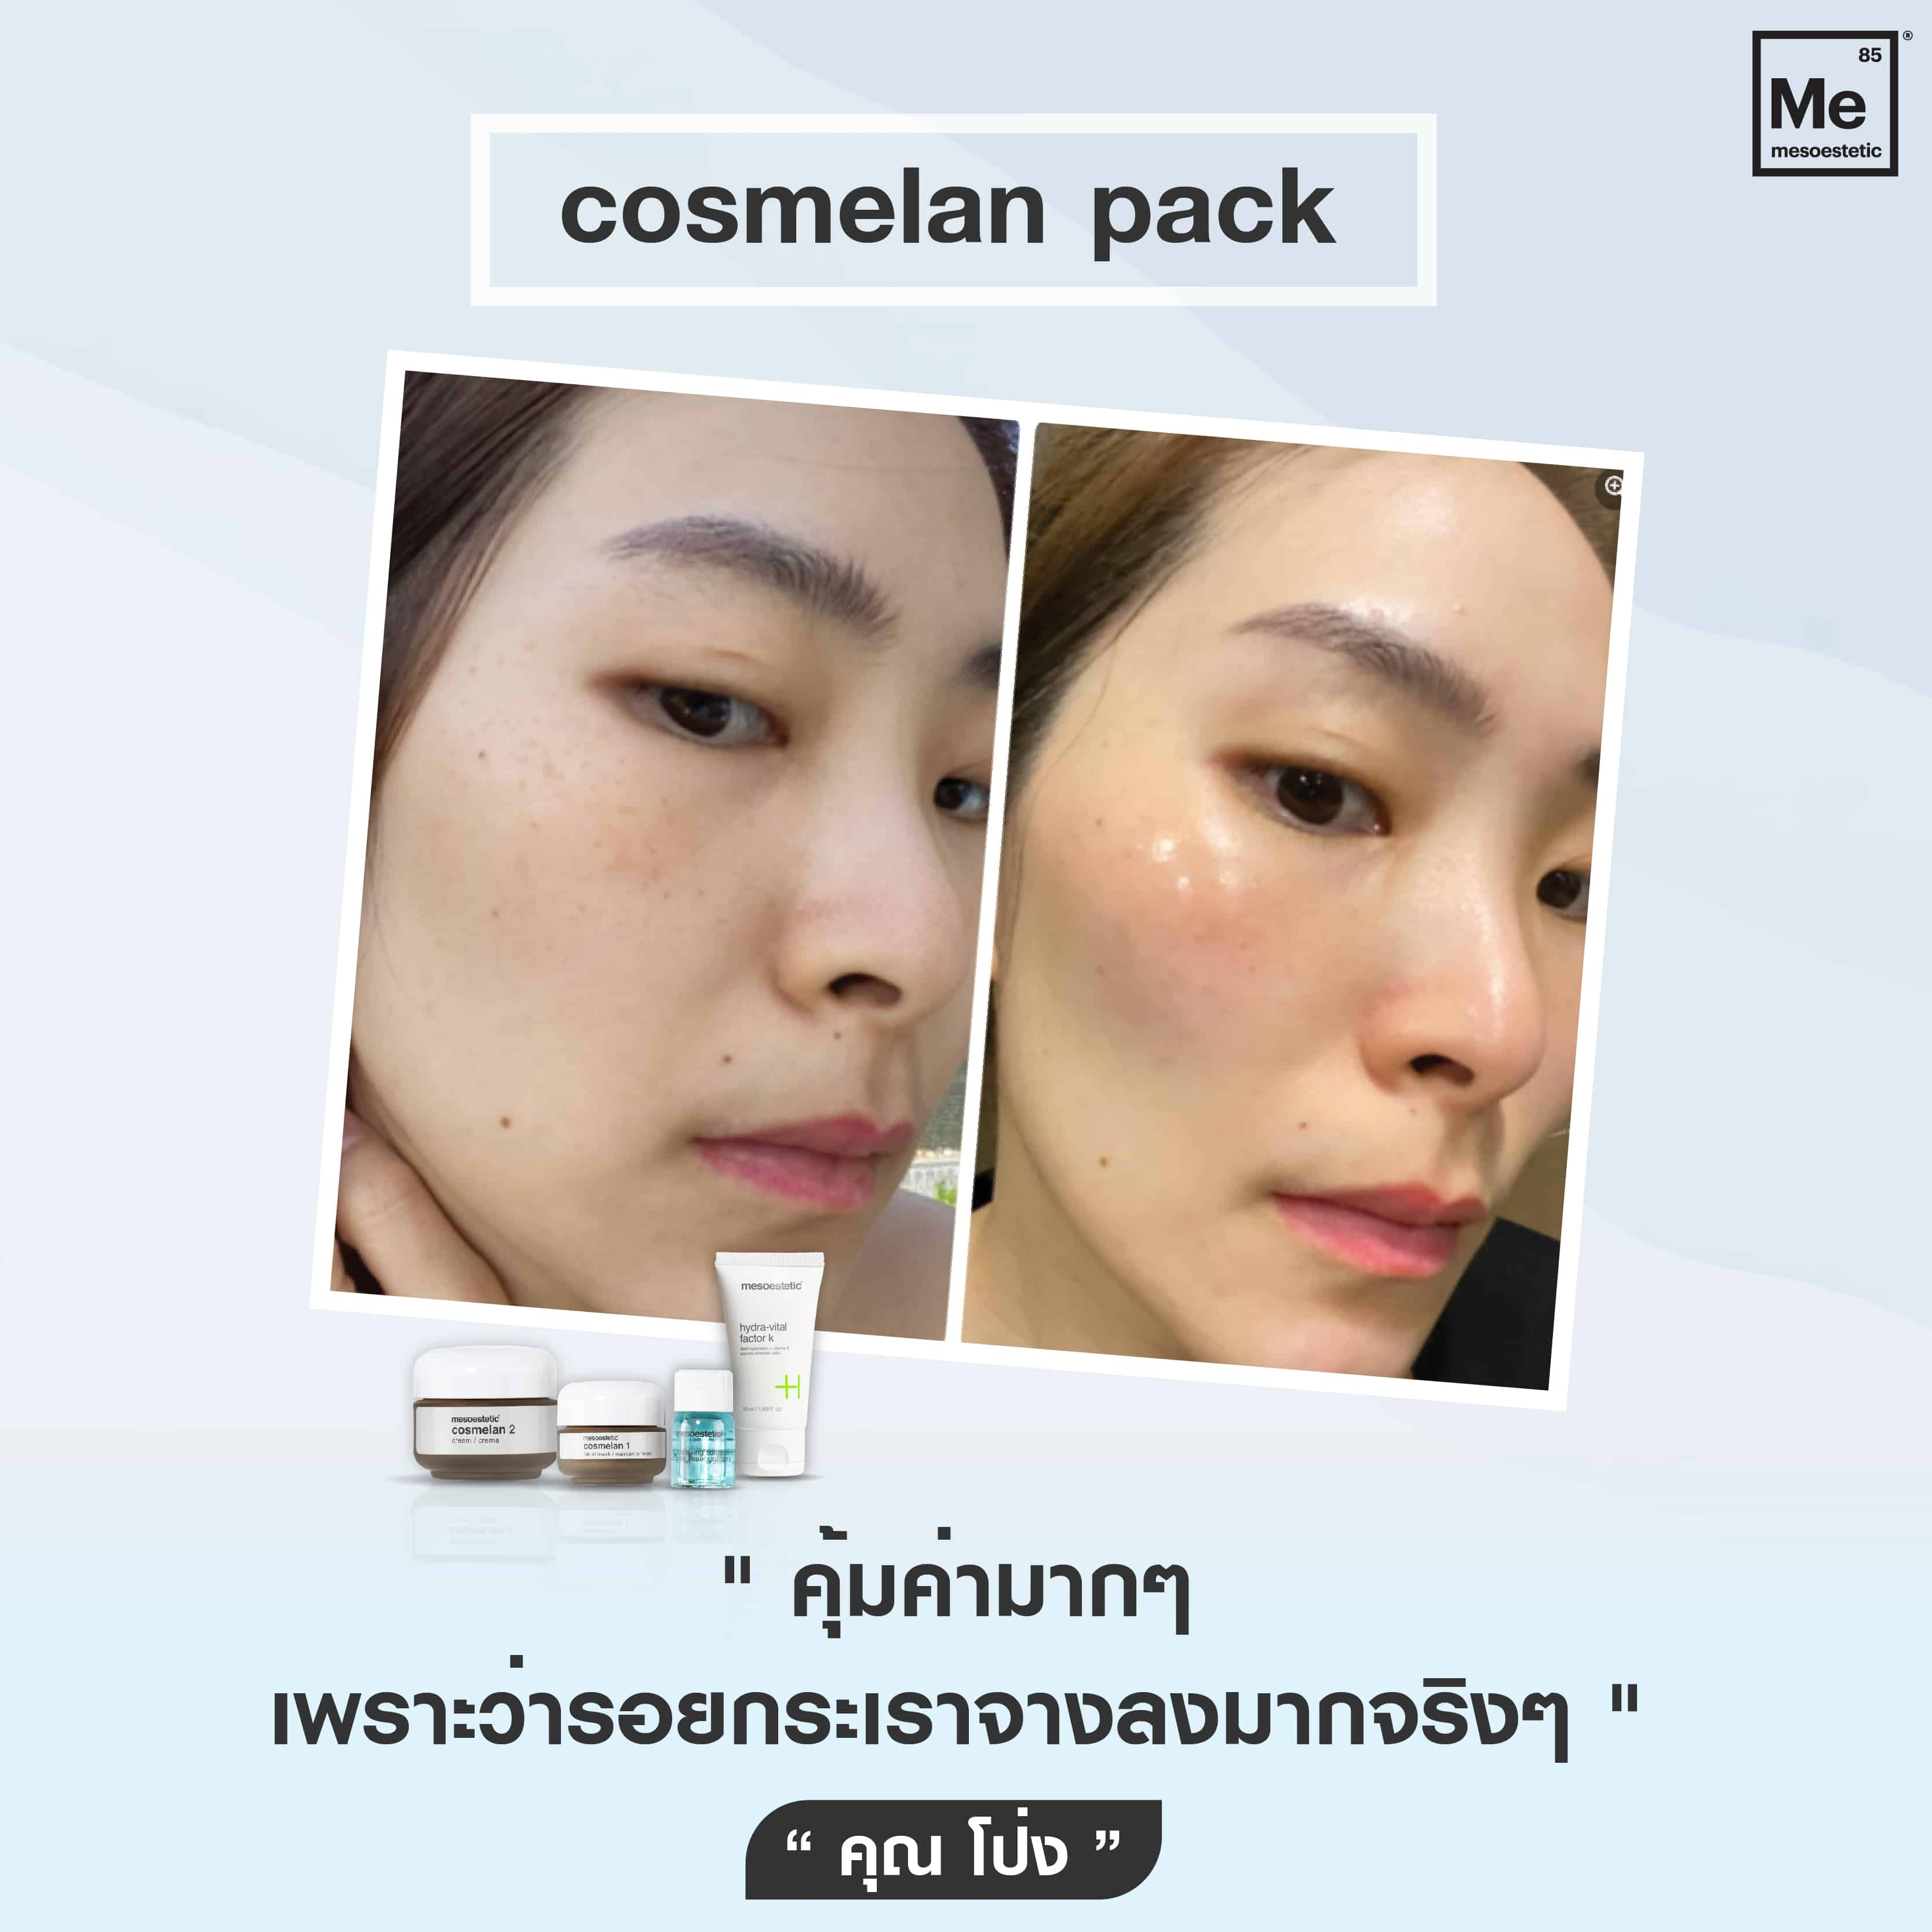 06 Review cosmelan-01